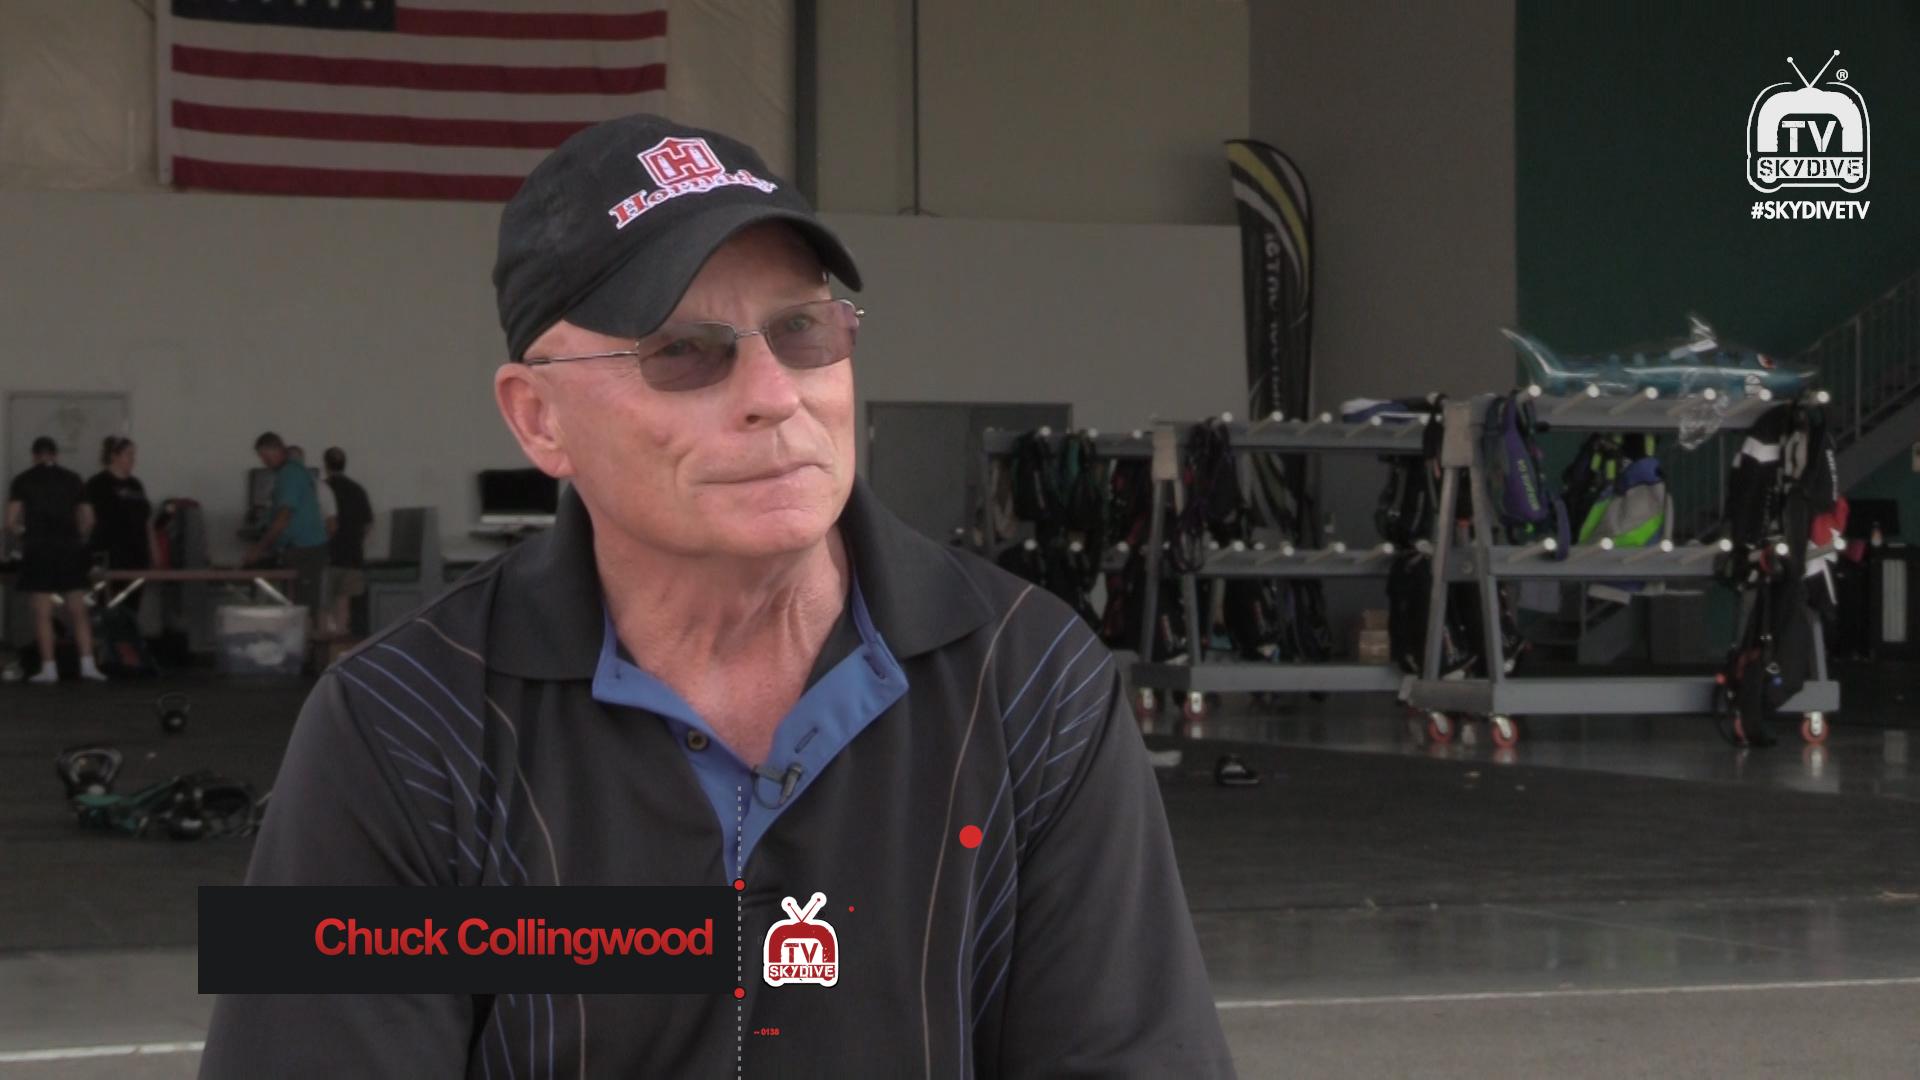 Chuck Collingwood